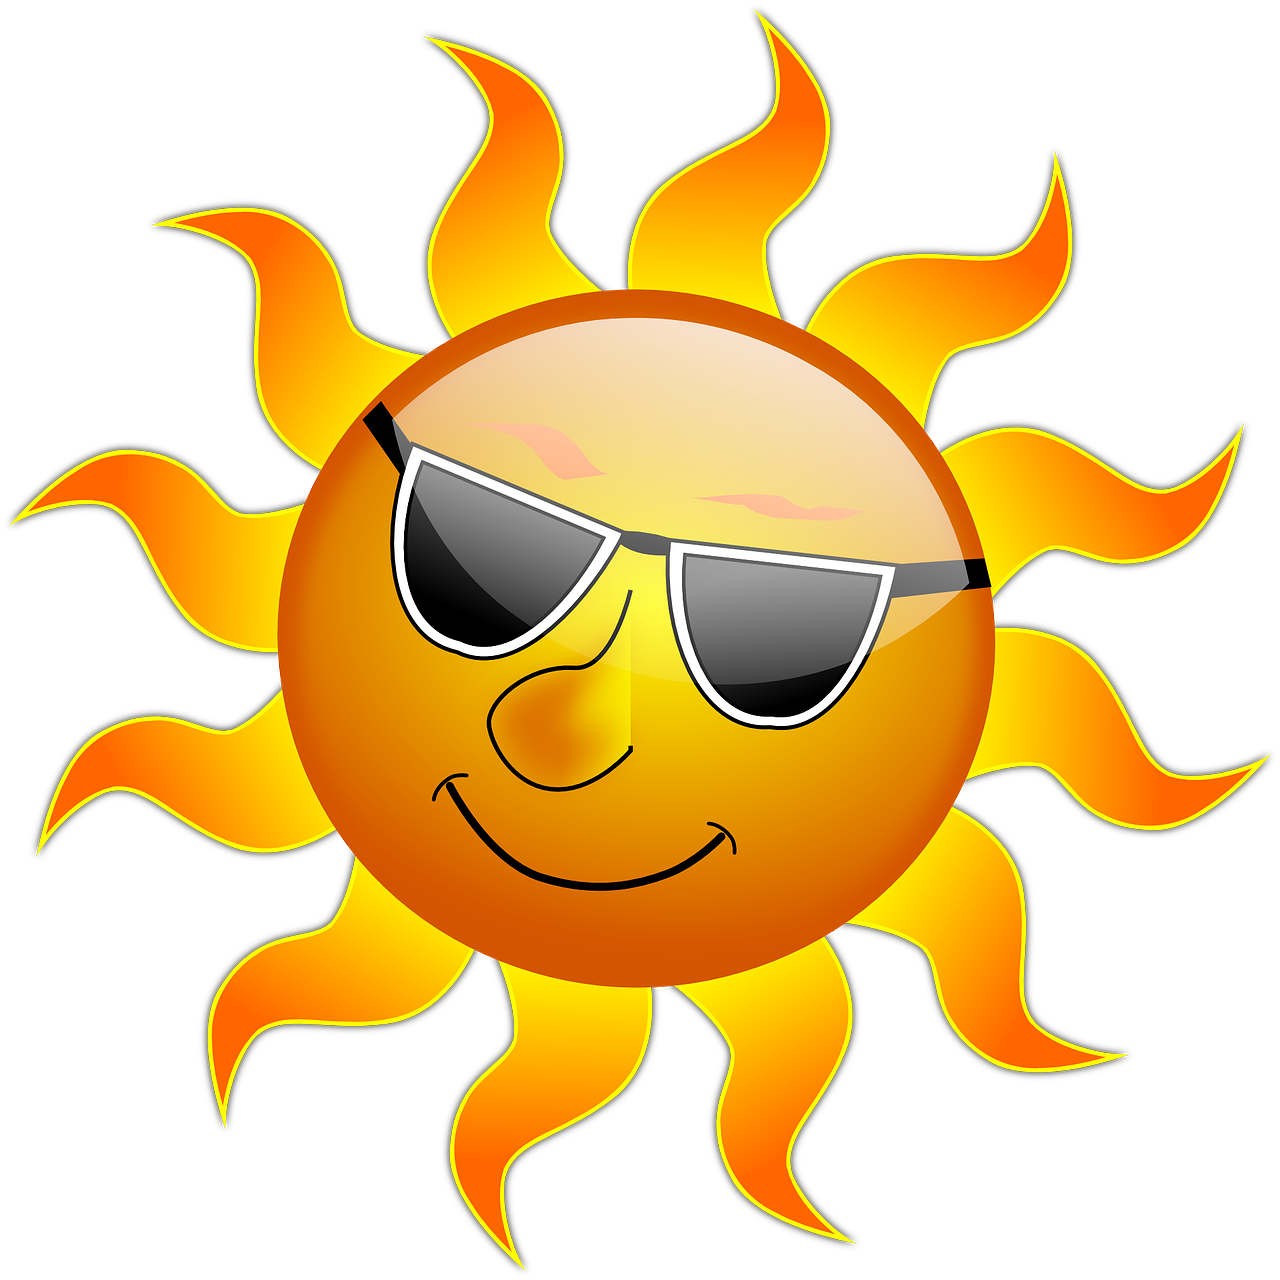 sun-151763_1280.png